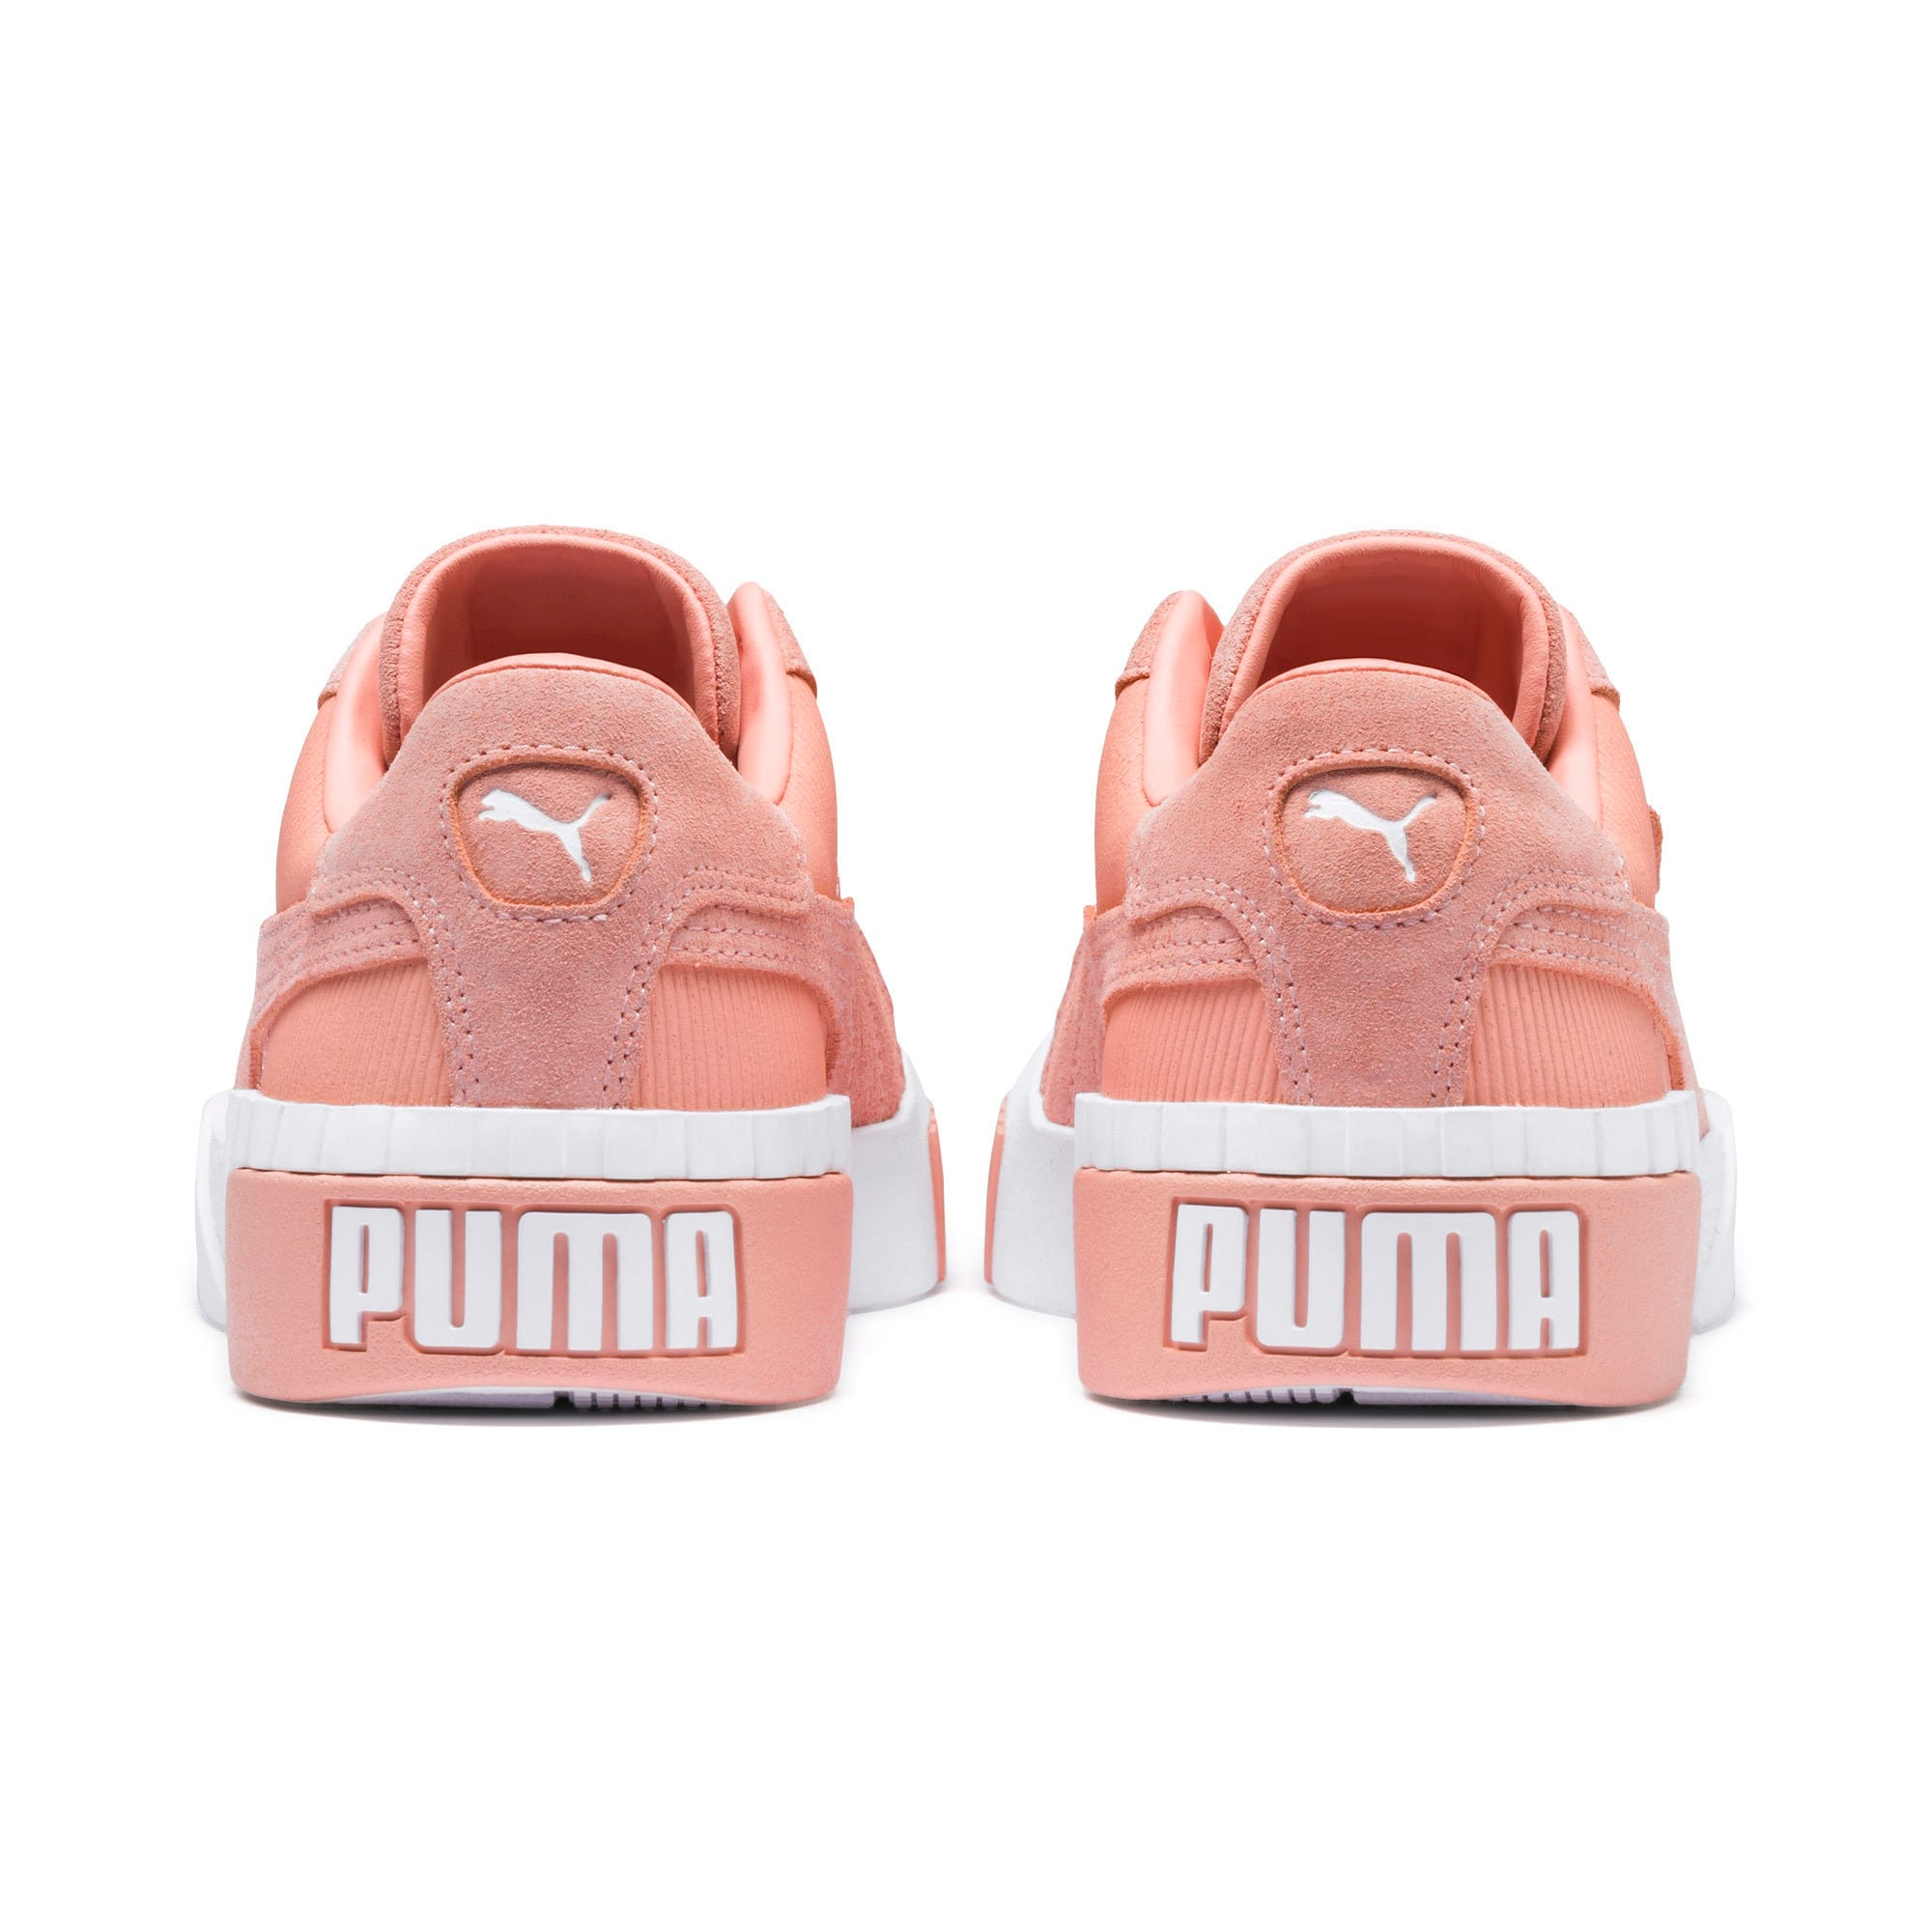 Thumbnail 4 of Cali Palm Springs Women's Sneakers, Peach Bud, medium